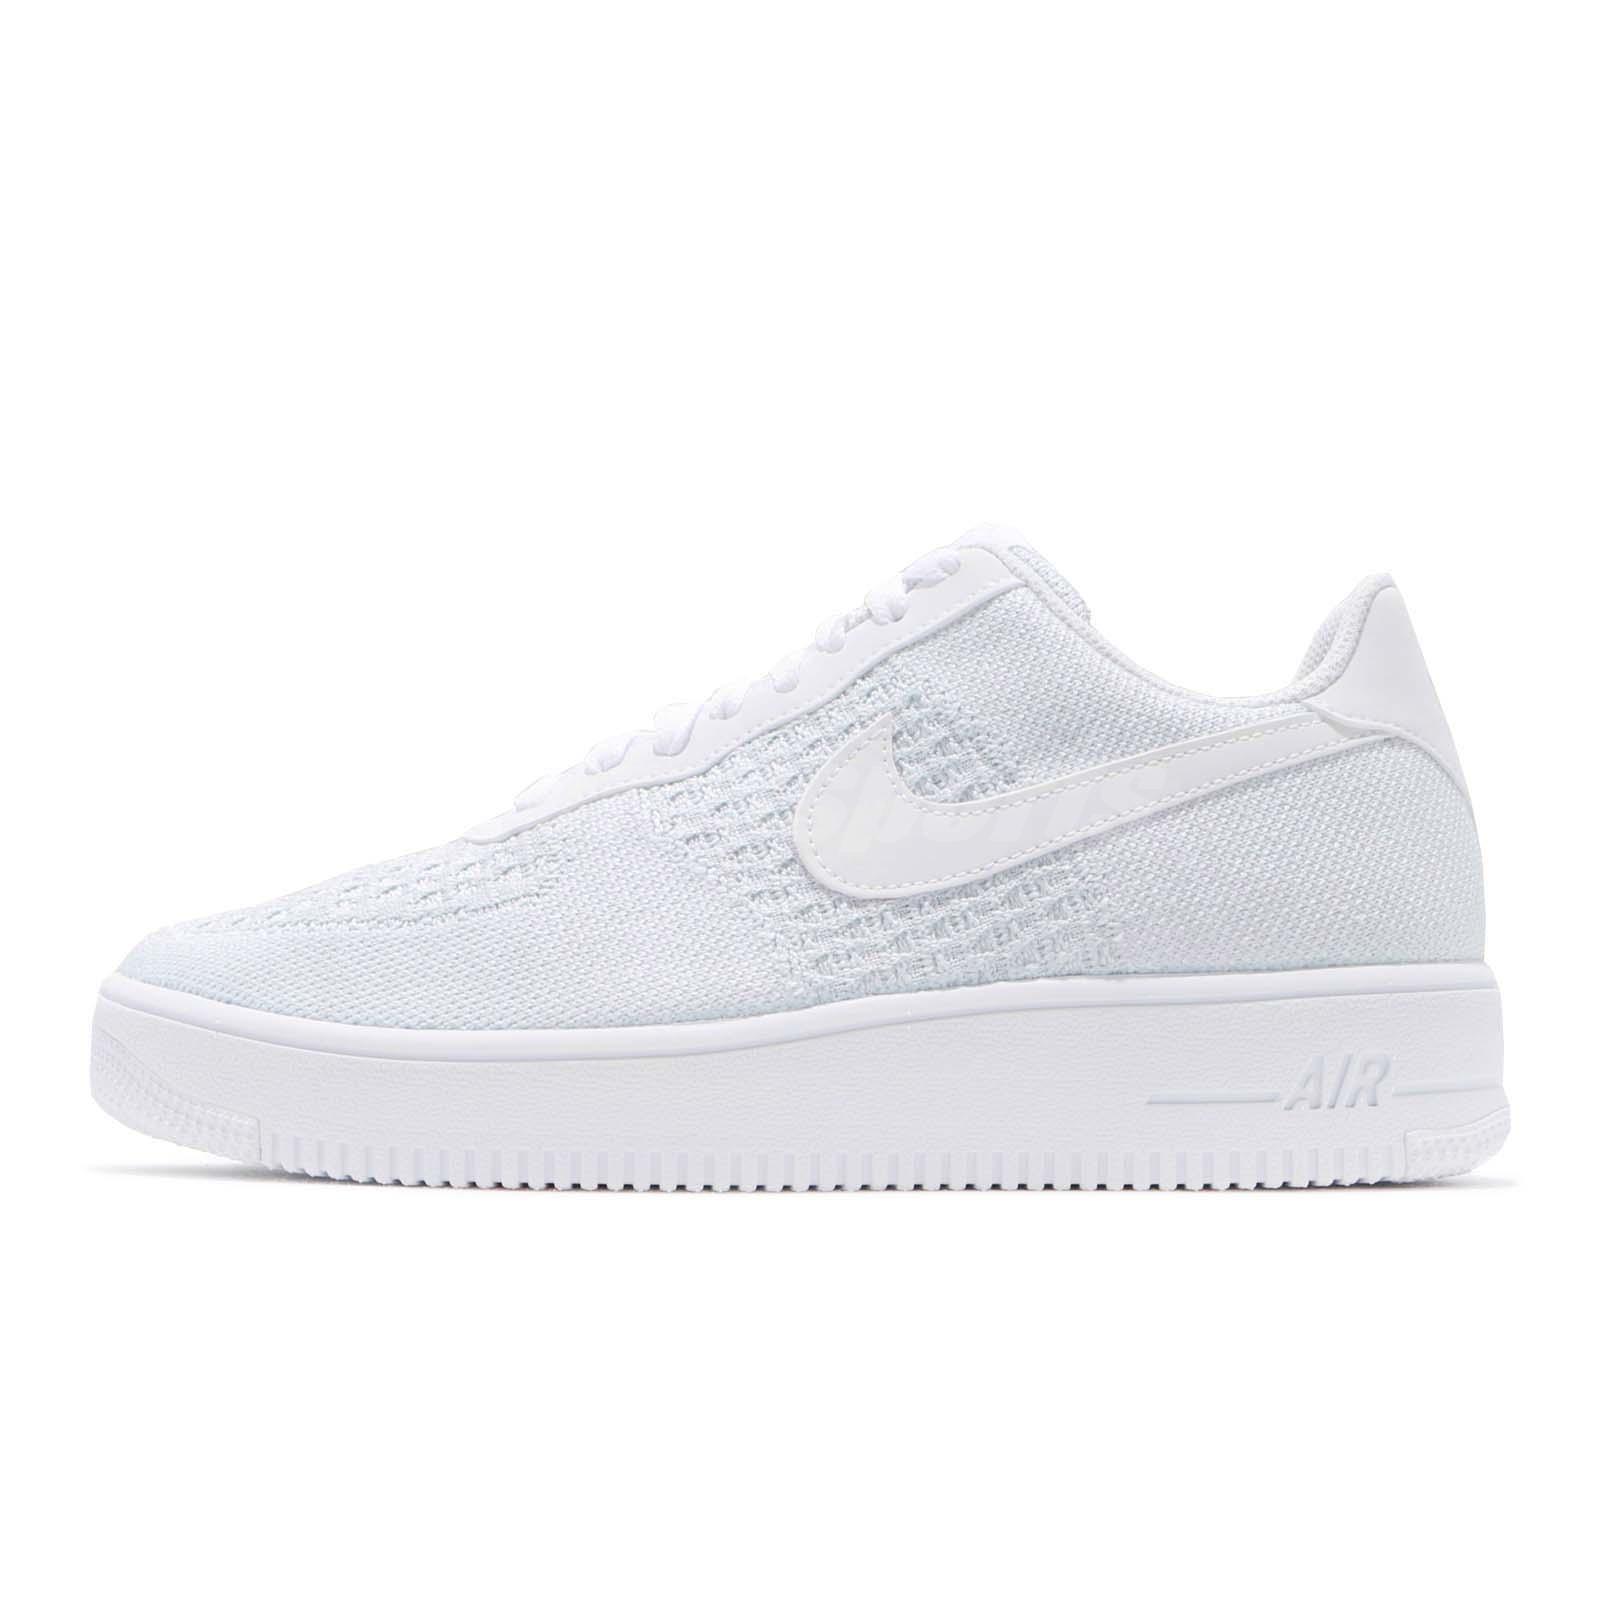 Sherlock Holmes Caña vídeo  Nike Air Force 1 Flyknit 2.0 White Pure Platinum Men Casual Shoes AF1  AV3042-100 | eBay